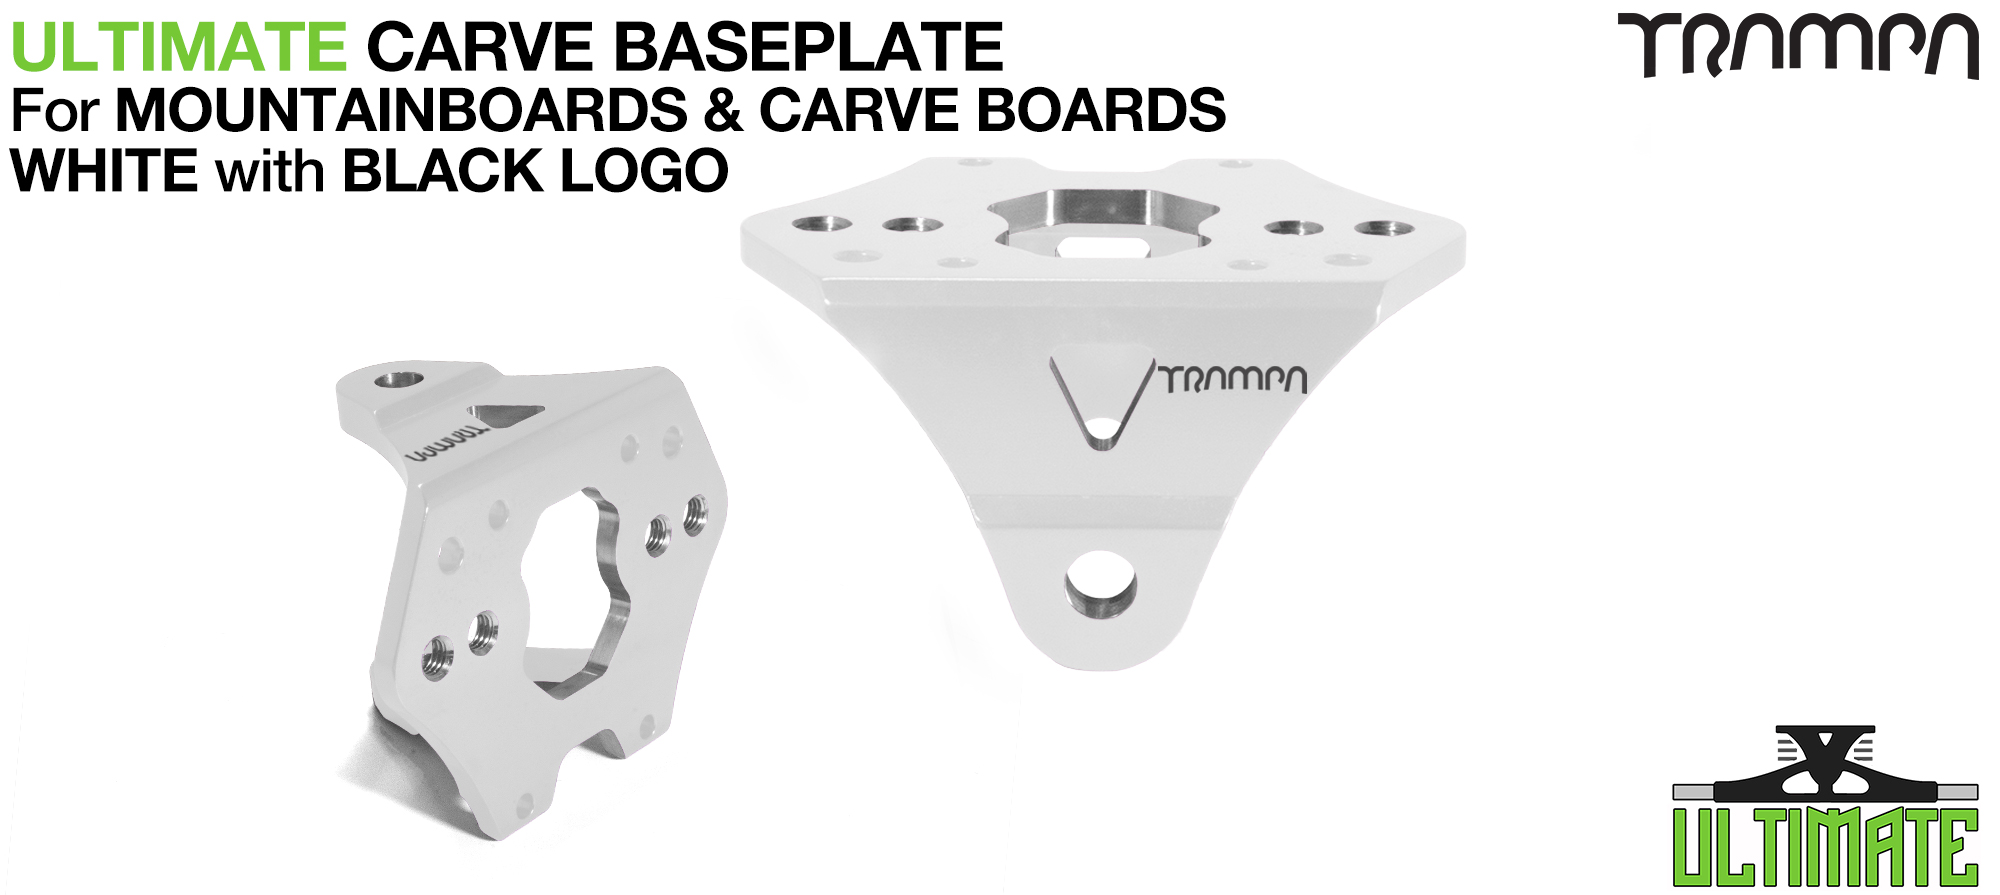 Carveboard ULTIMATE Baseplate WHITE - T6 Aluminum Powder coated & CNC lightened - Black logo